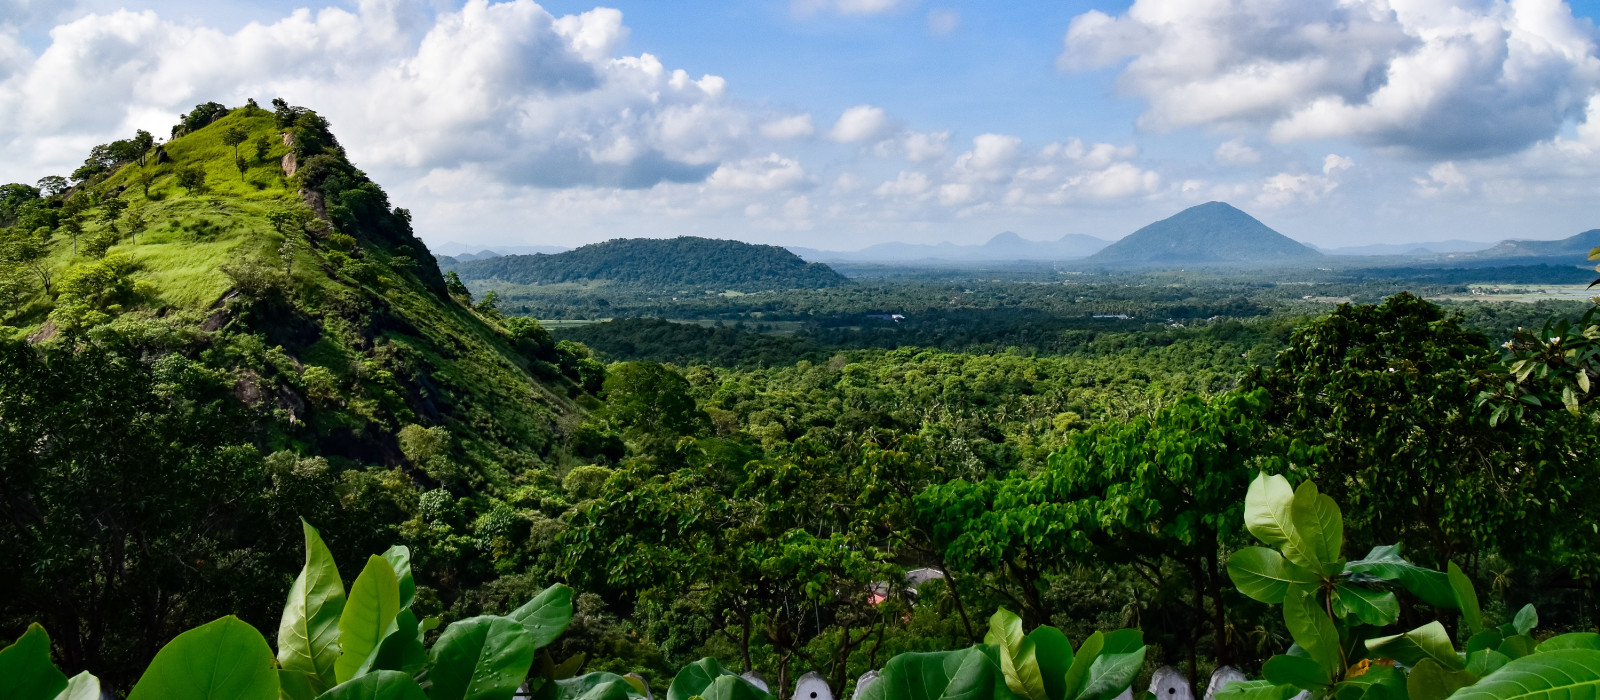 Destination Gal Oya National Park Sri Lanka